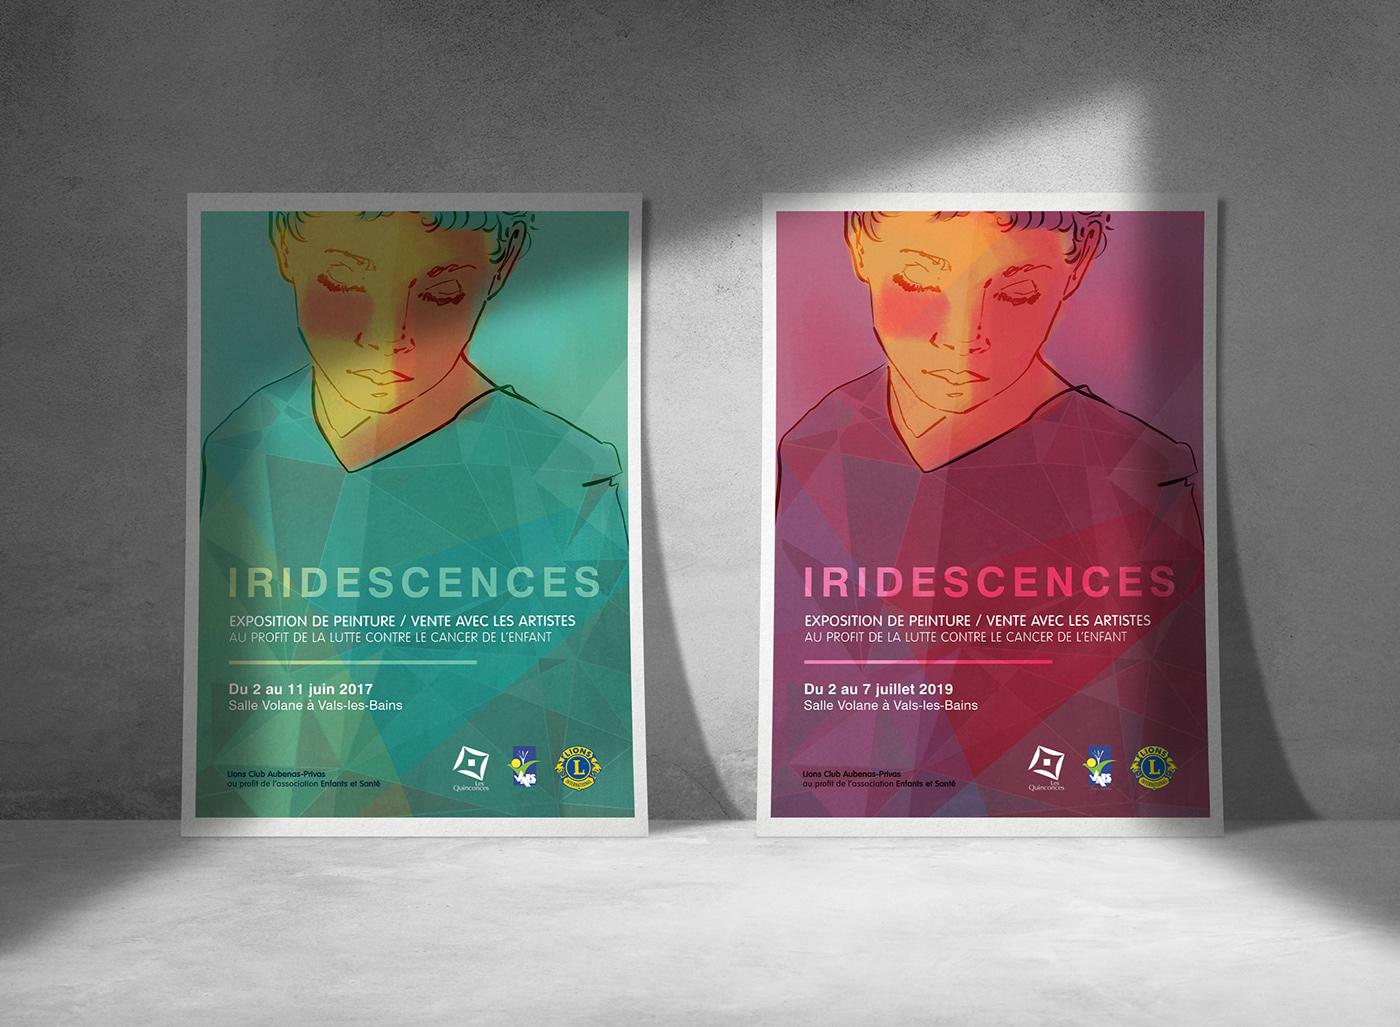 charity children communication Exhibition  ILLUSTRATION  poster